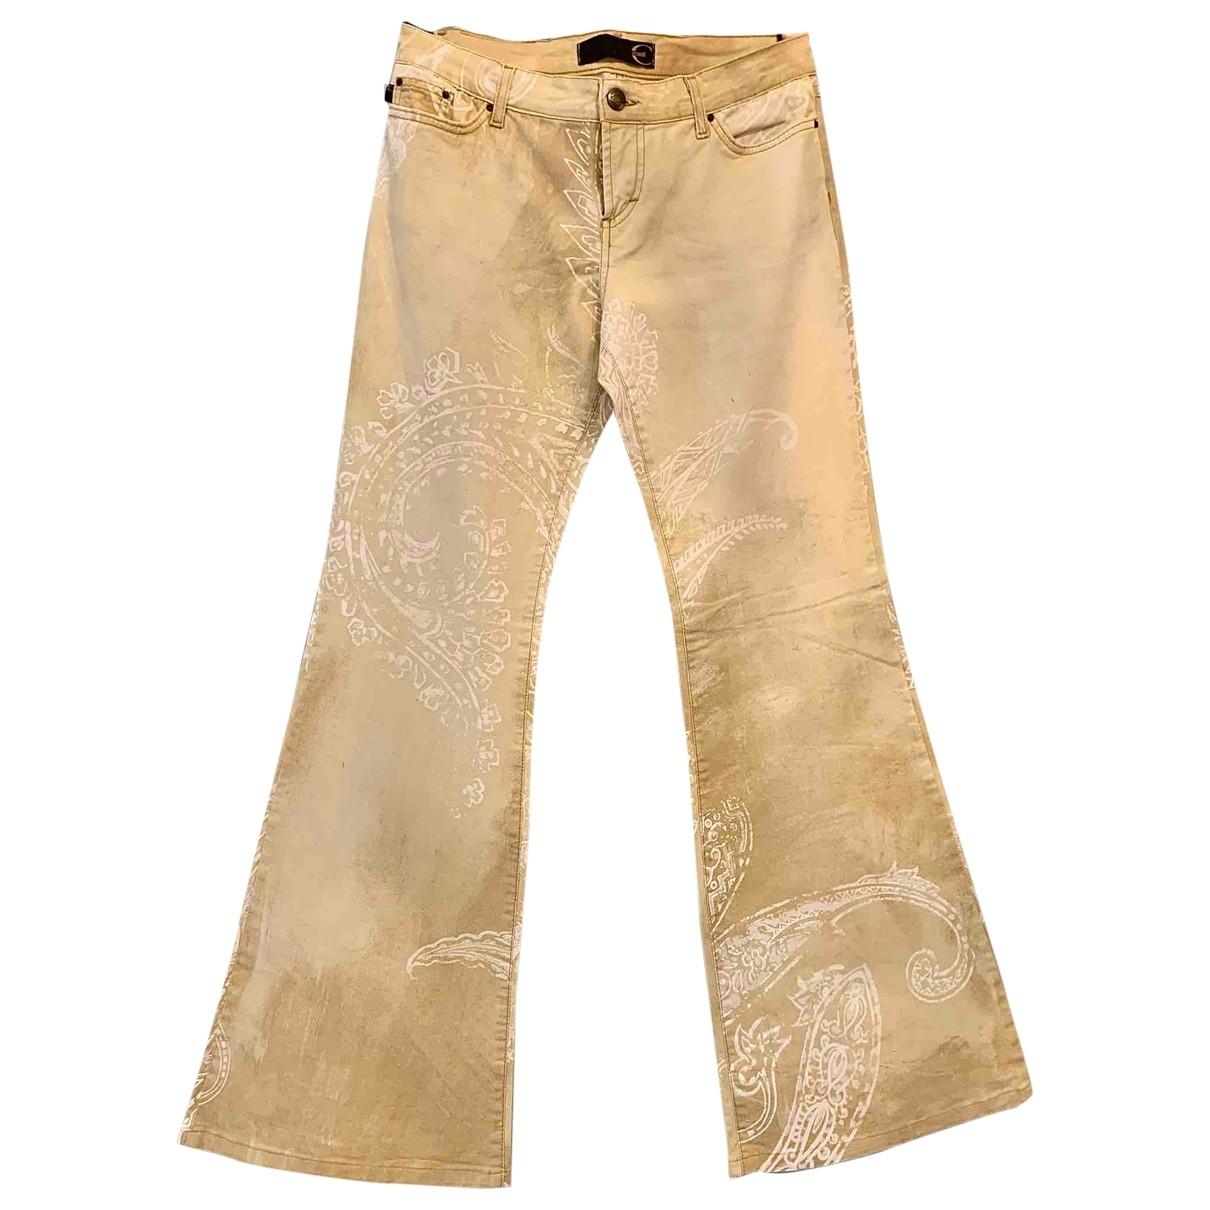 Just Cavalli \N Ecru Cotton Trousers for Women M International